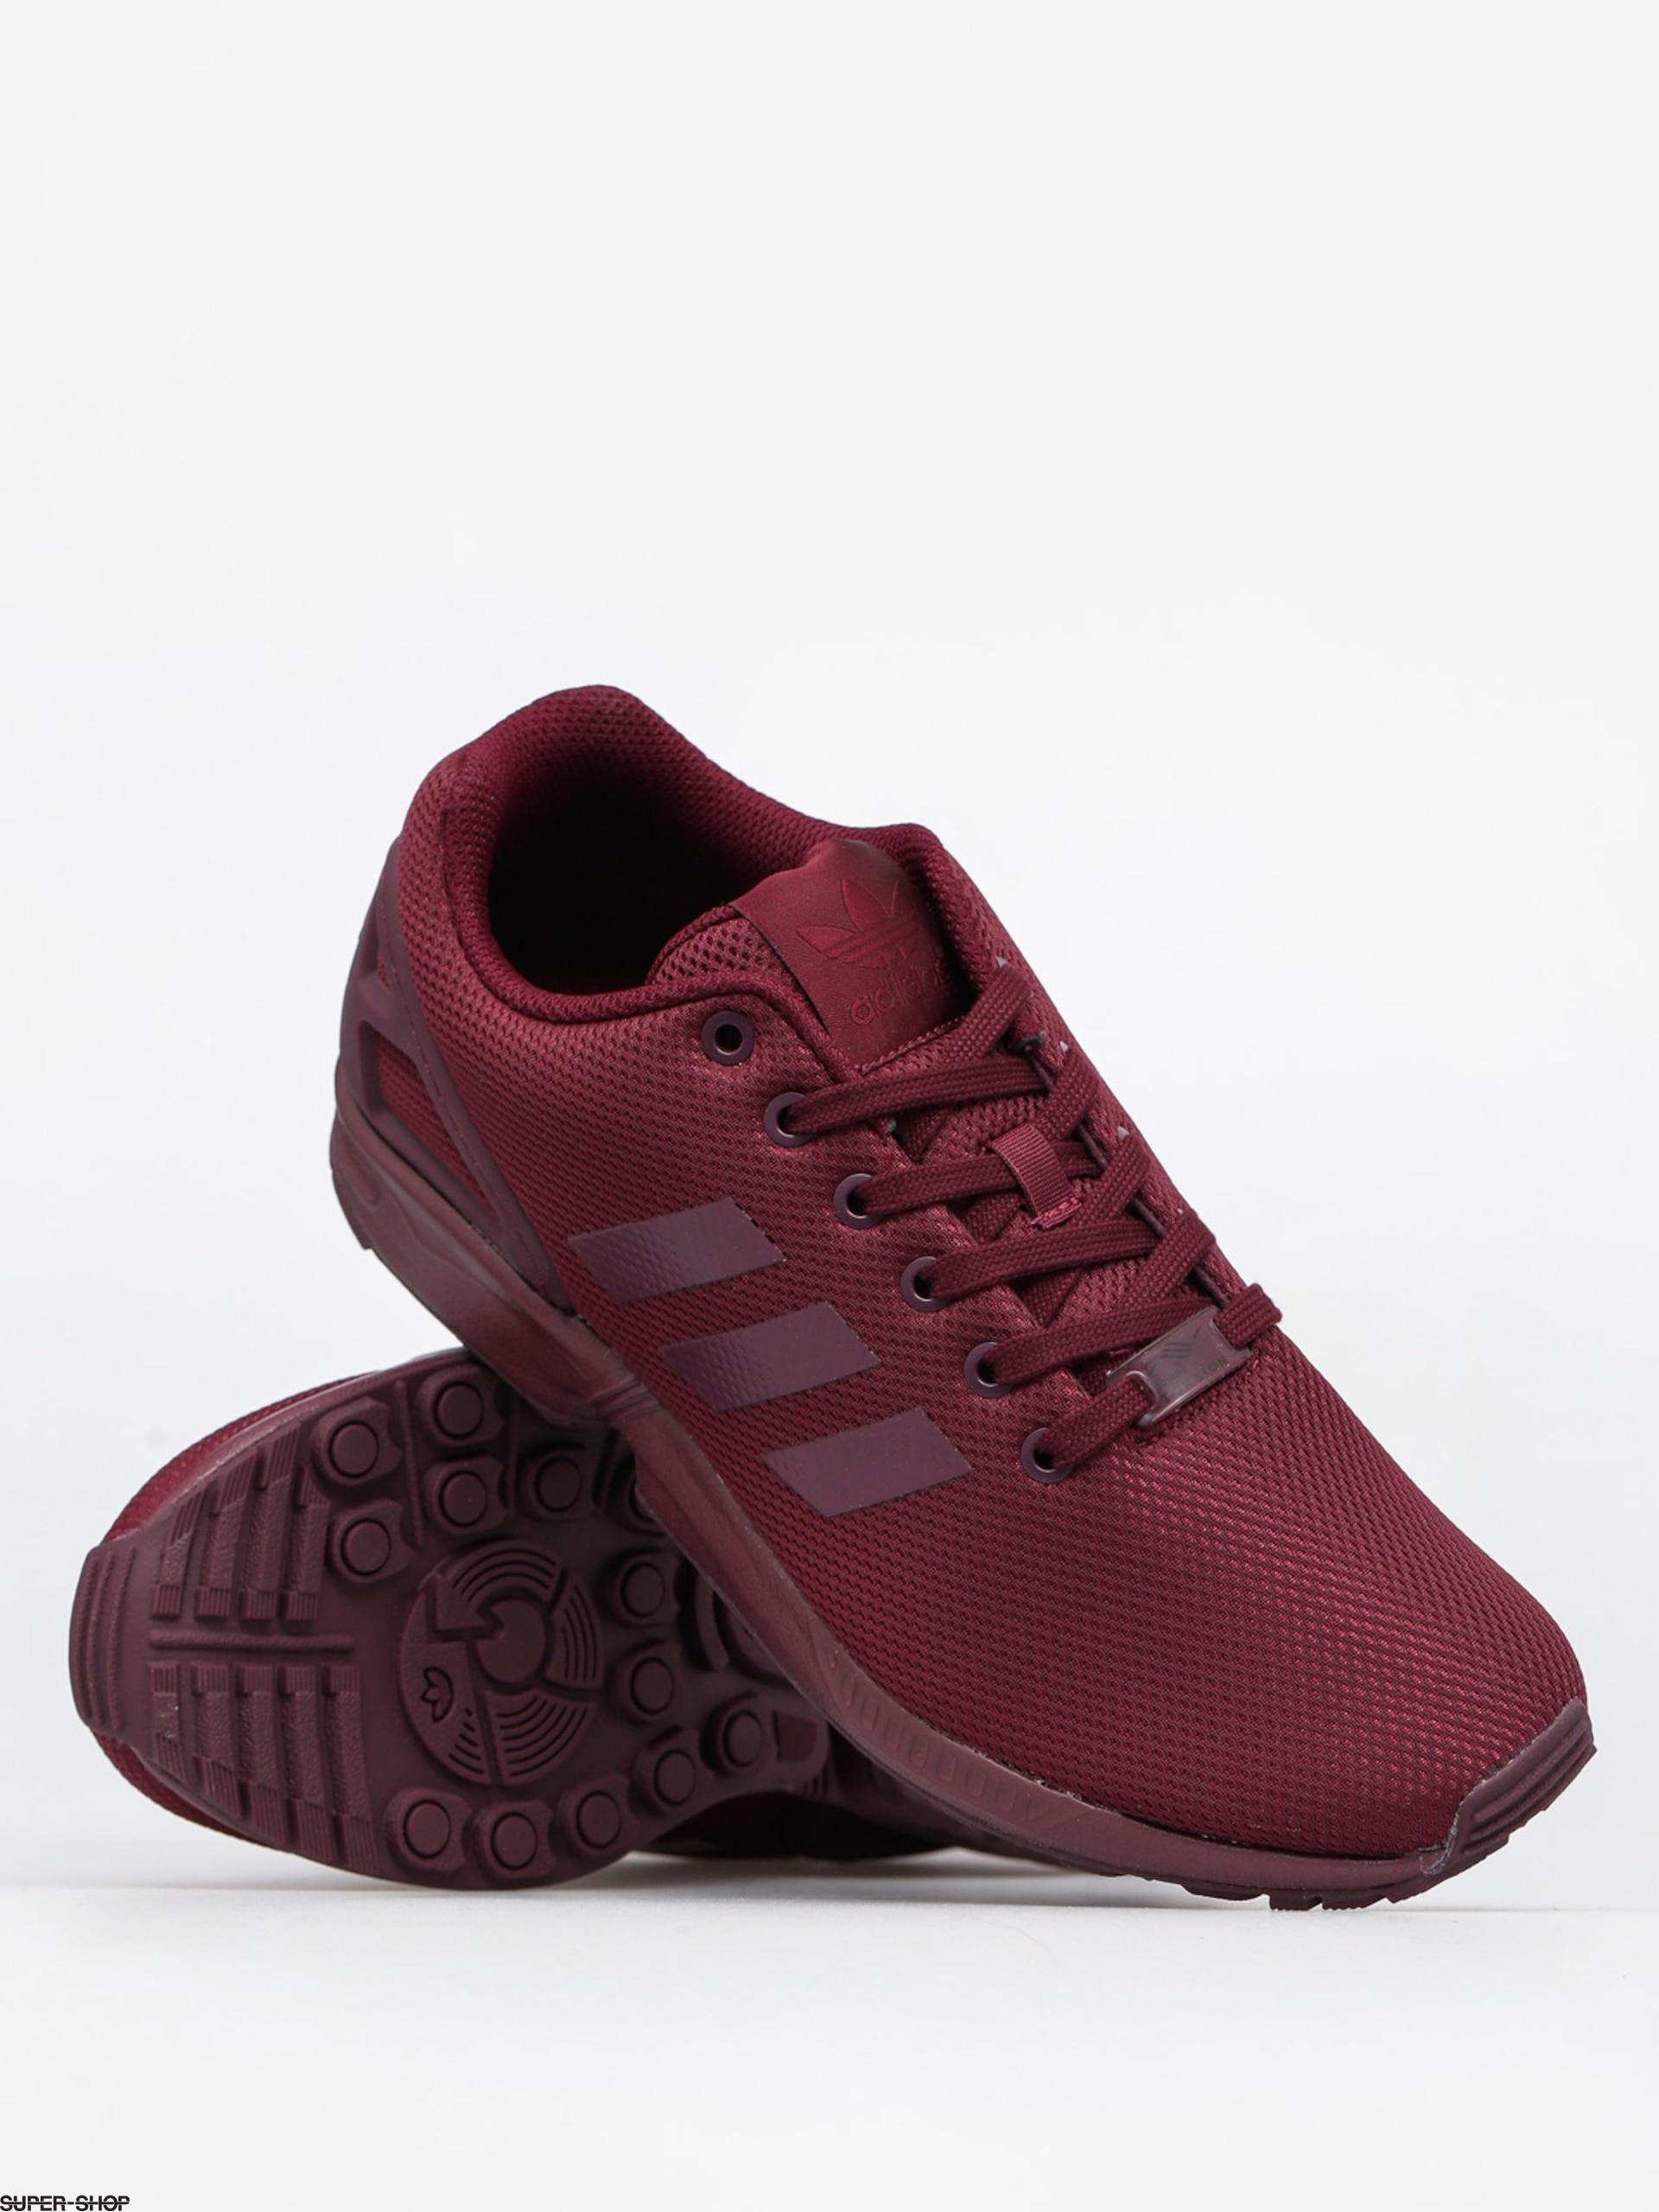 adidas Shoes Zx Flux (maroon/ftwwht/cblack)